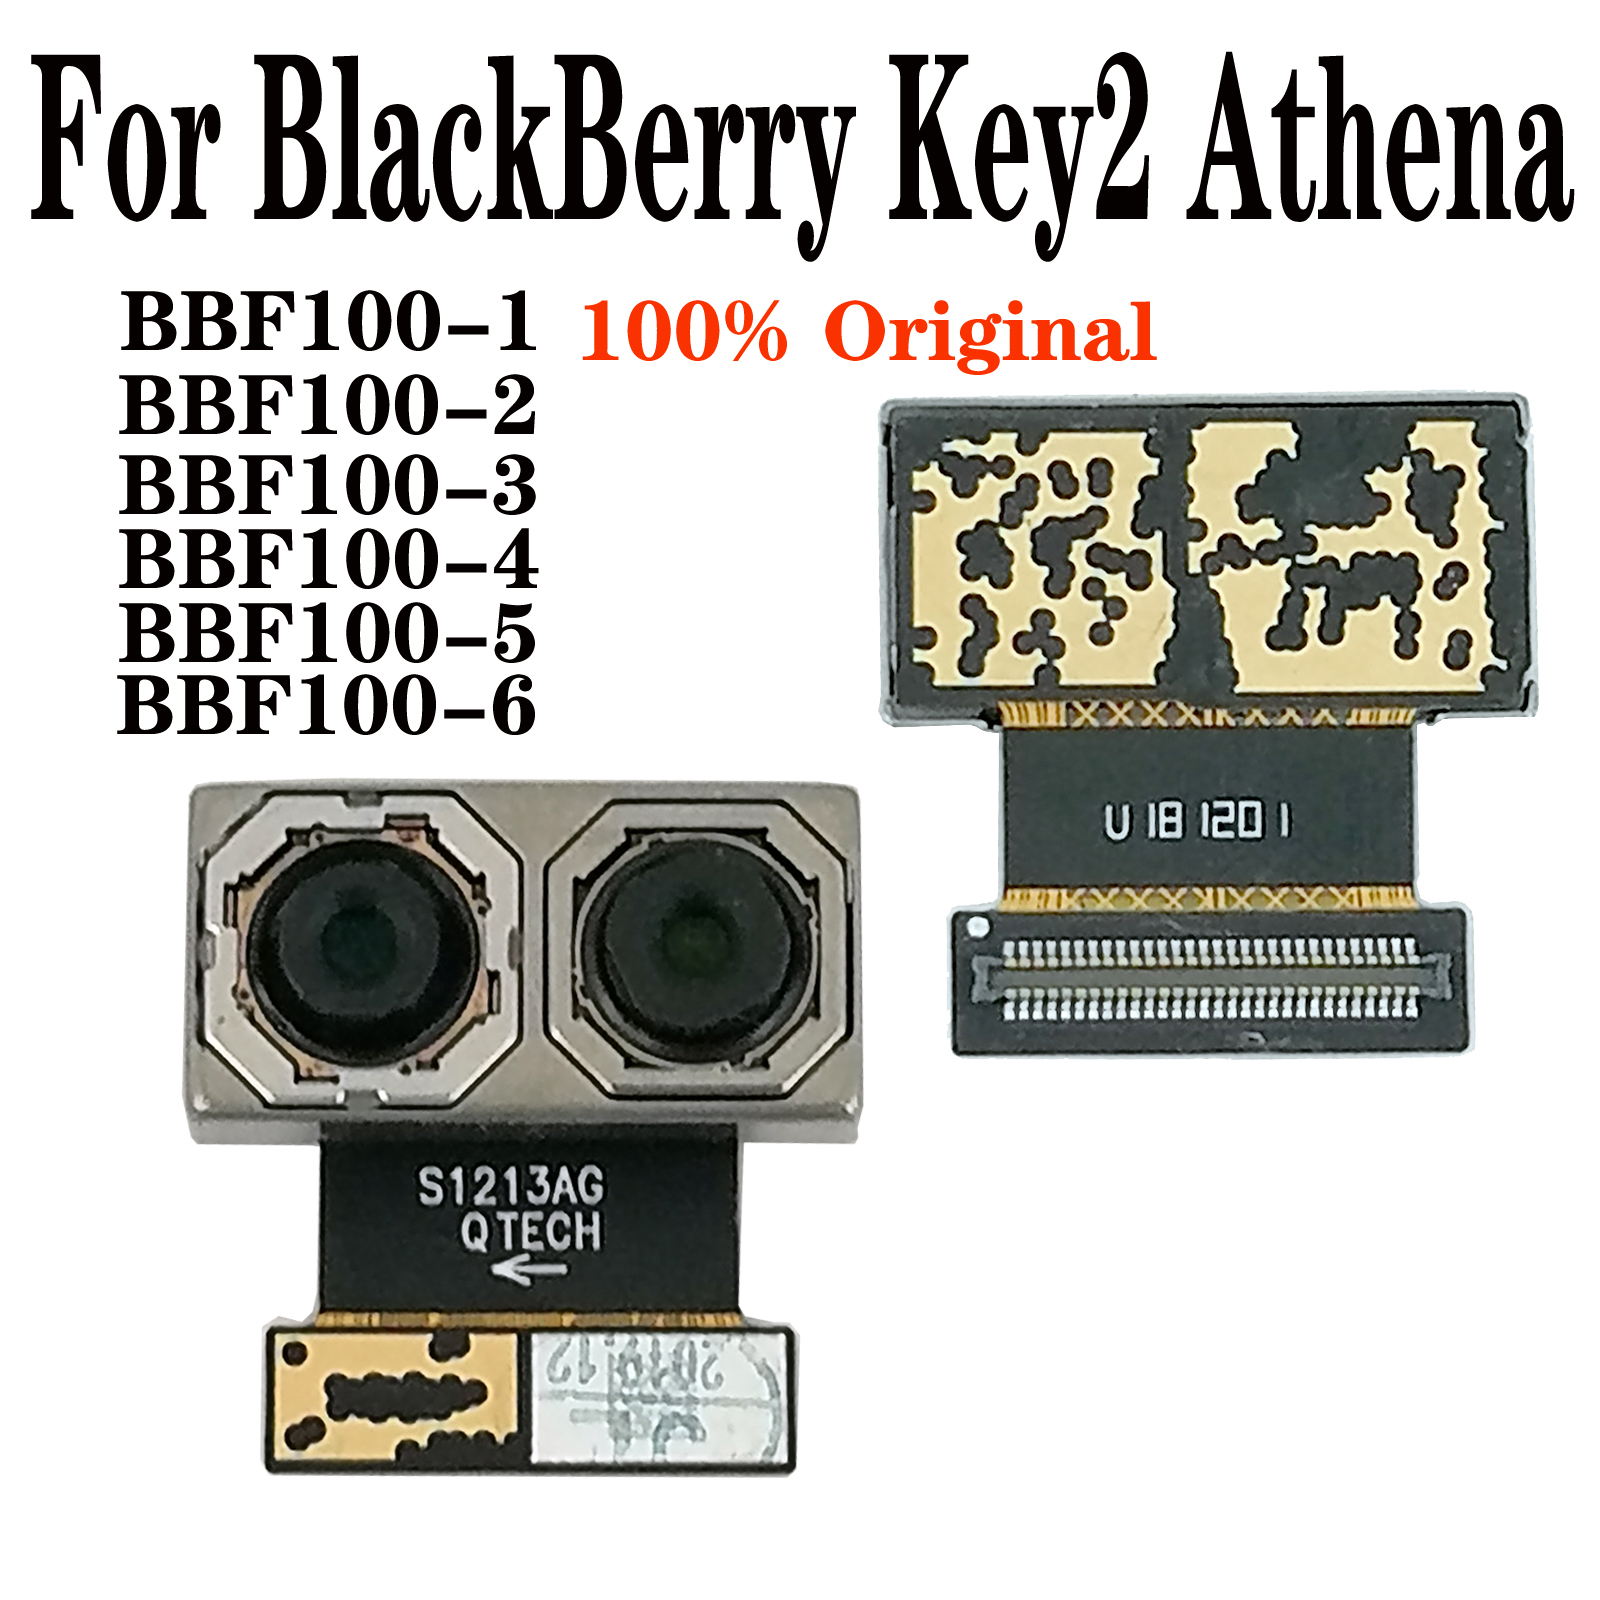 "Shyueda 100% Orig New For BlackBerry Key2 Key 2 Athena BBF100-1-2-3-4-5-6 4.5"" Rear Back Main Camera Part Module"